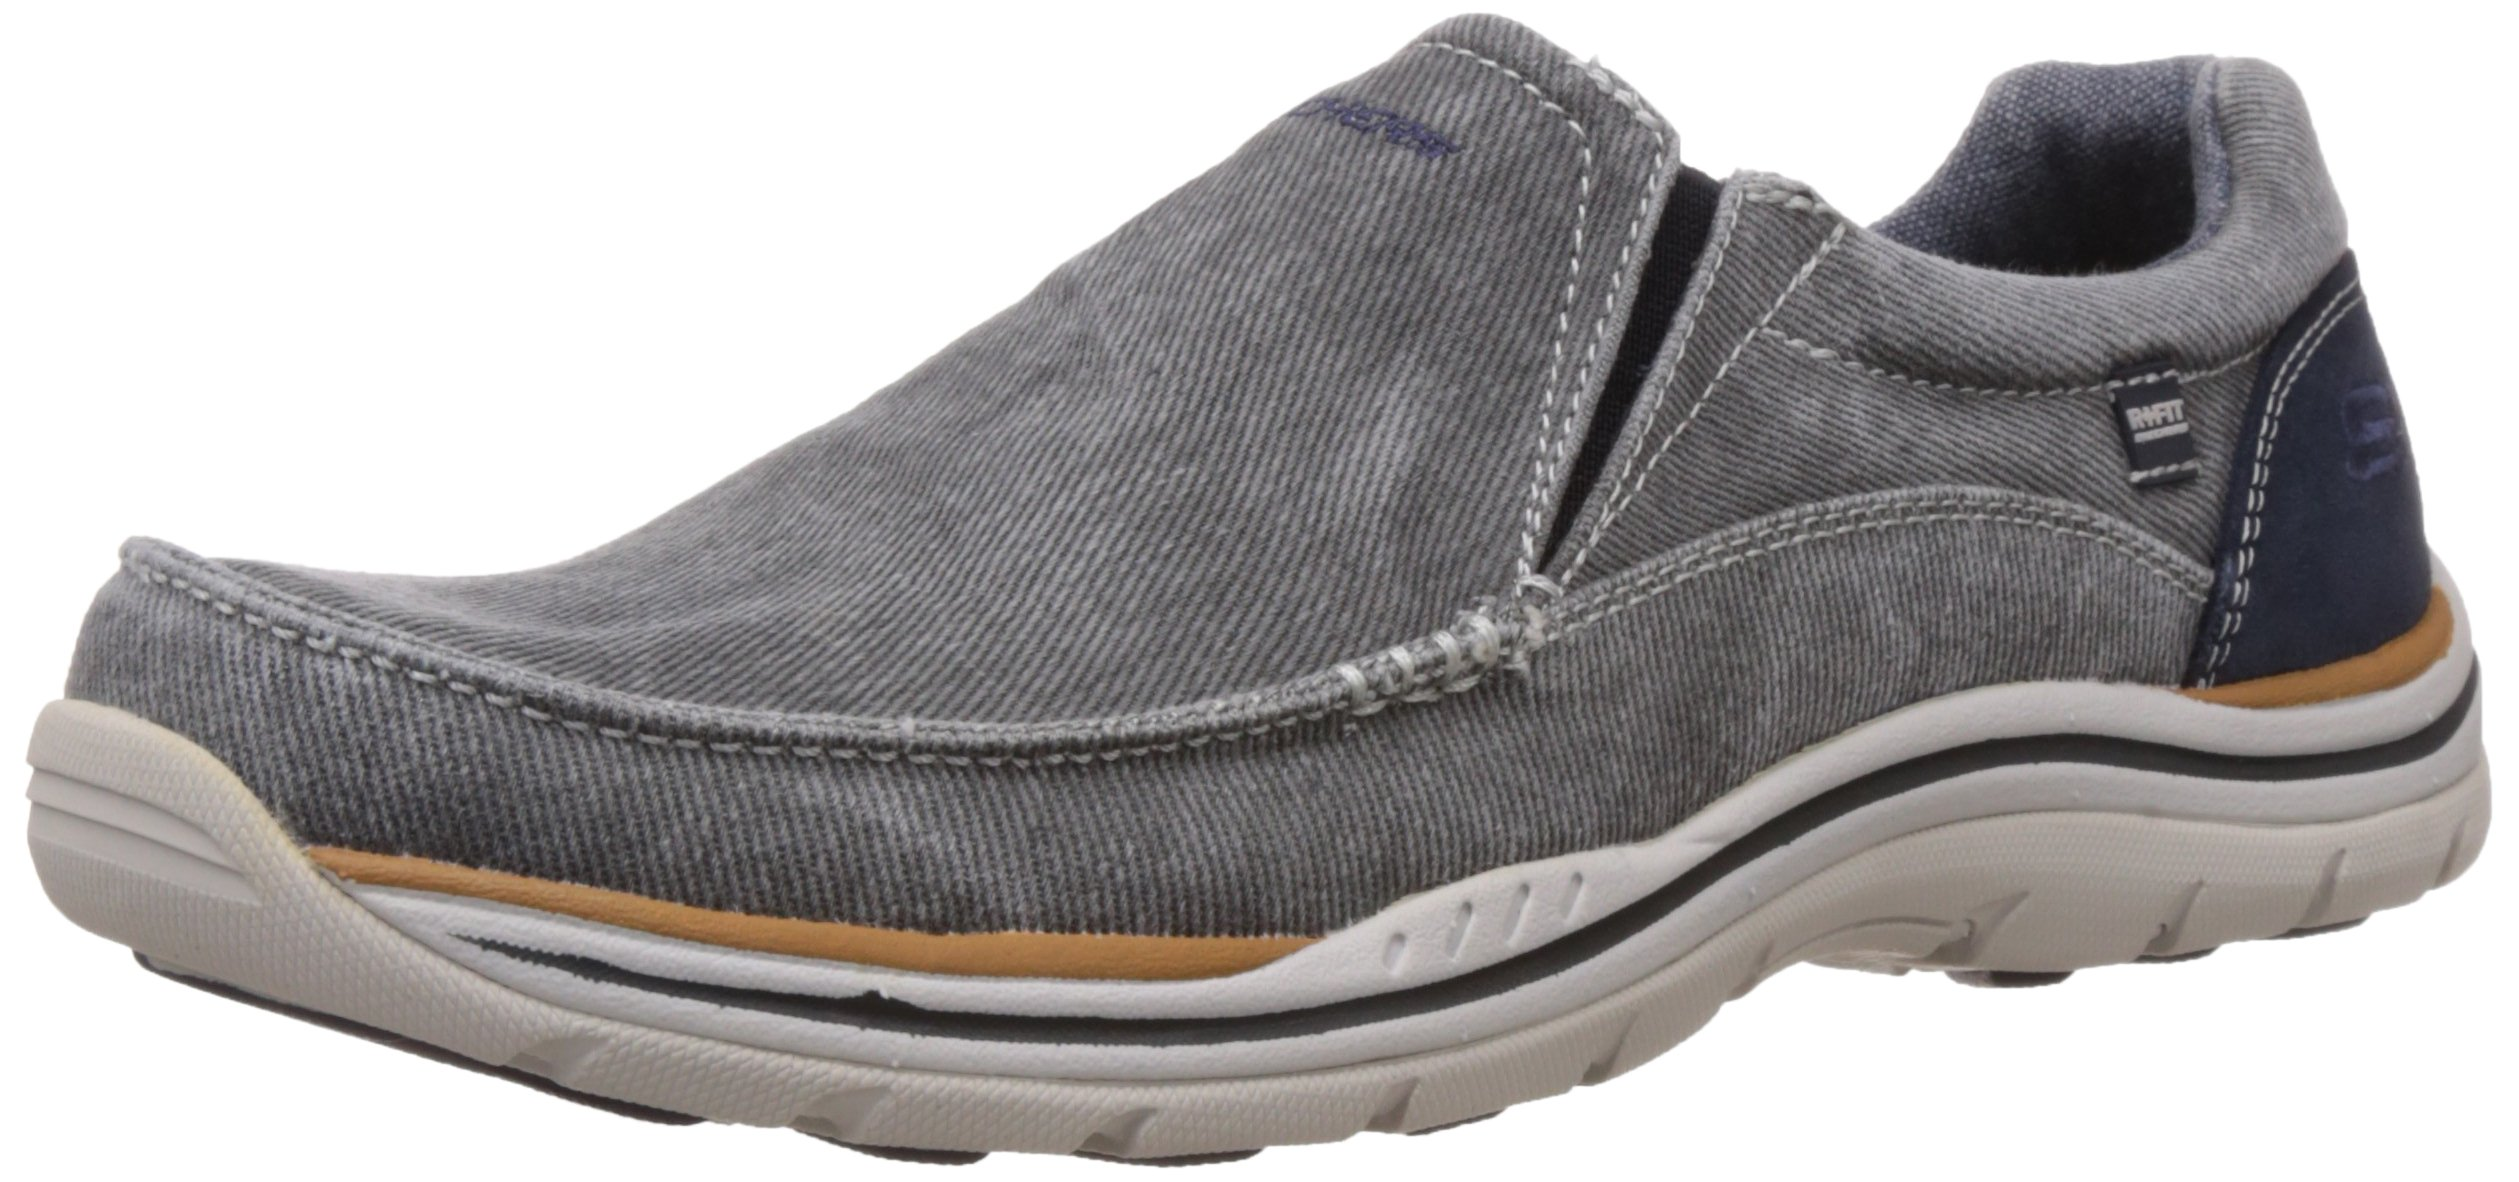 Skechers Men's EXPECTED- AVILLO Shoe, Blu, 12 Medium US